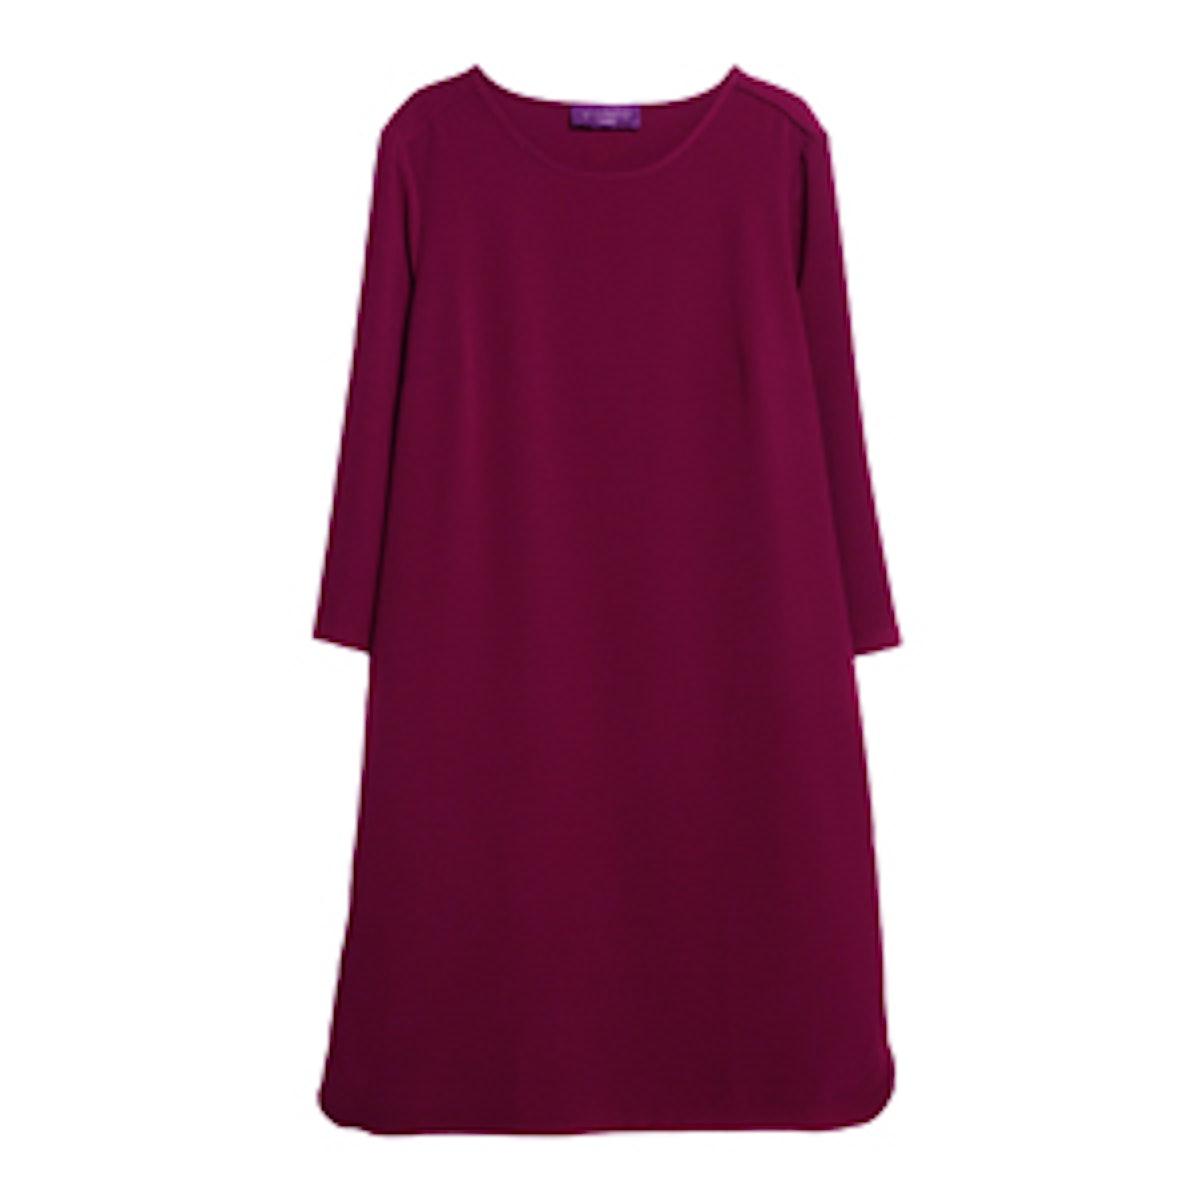 Violeta Slit Shift Dress in Maroon